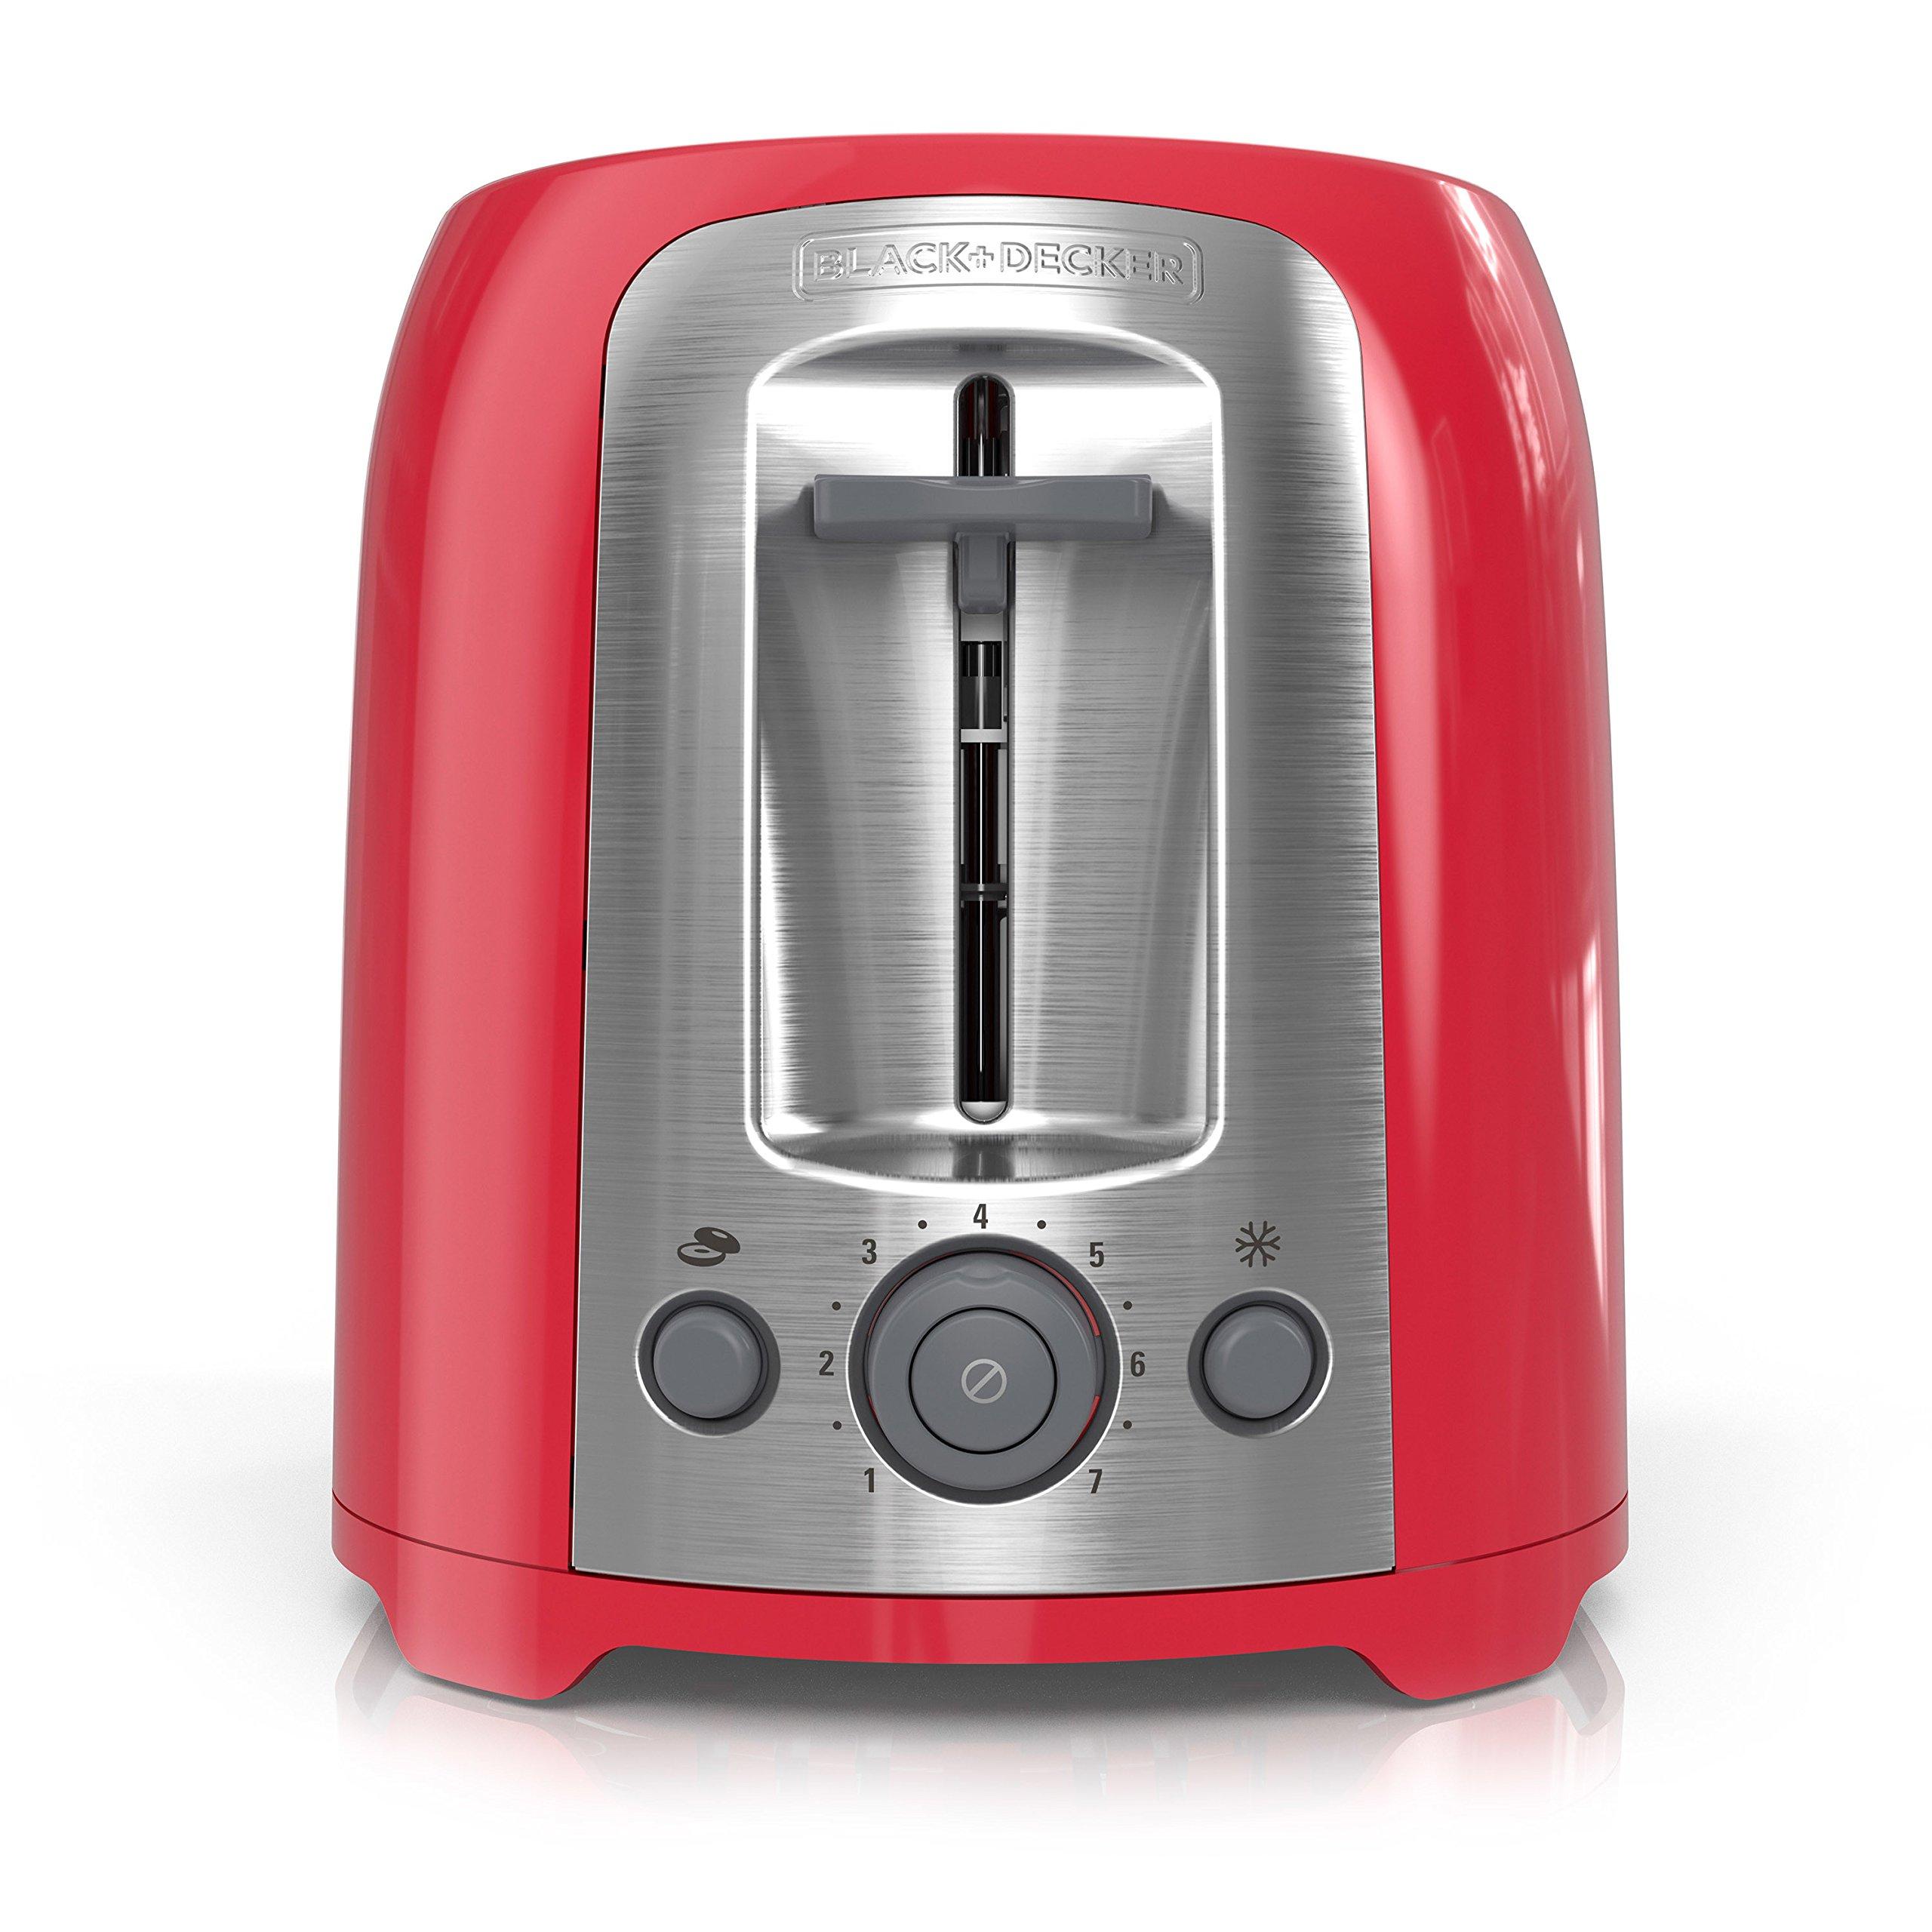 BLACK+DECKER 2-Slice Toaster, Red, TR1278RM by BLACK+DECKER (Image #8)